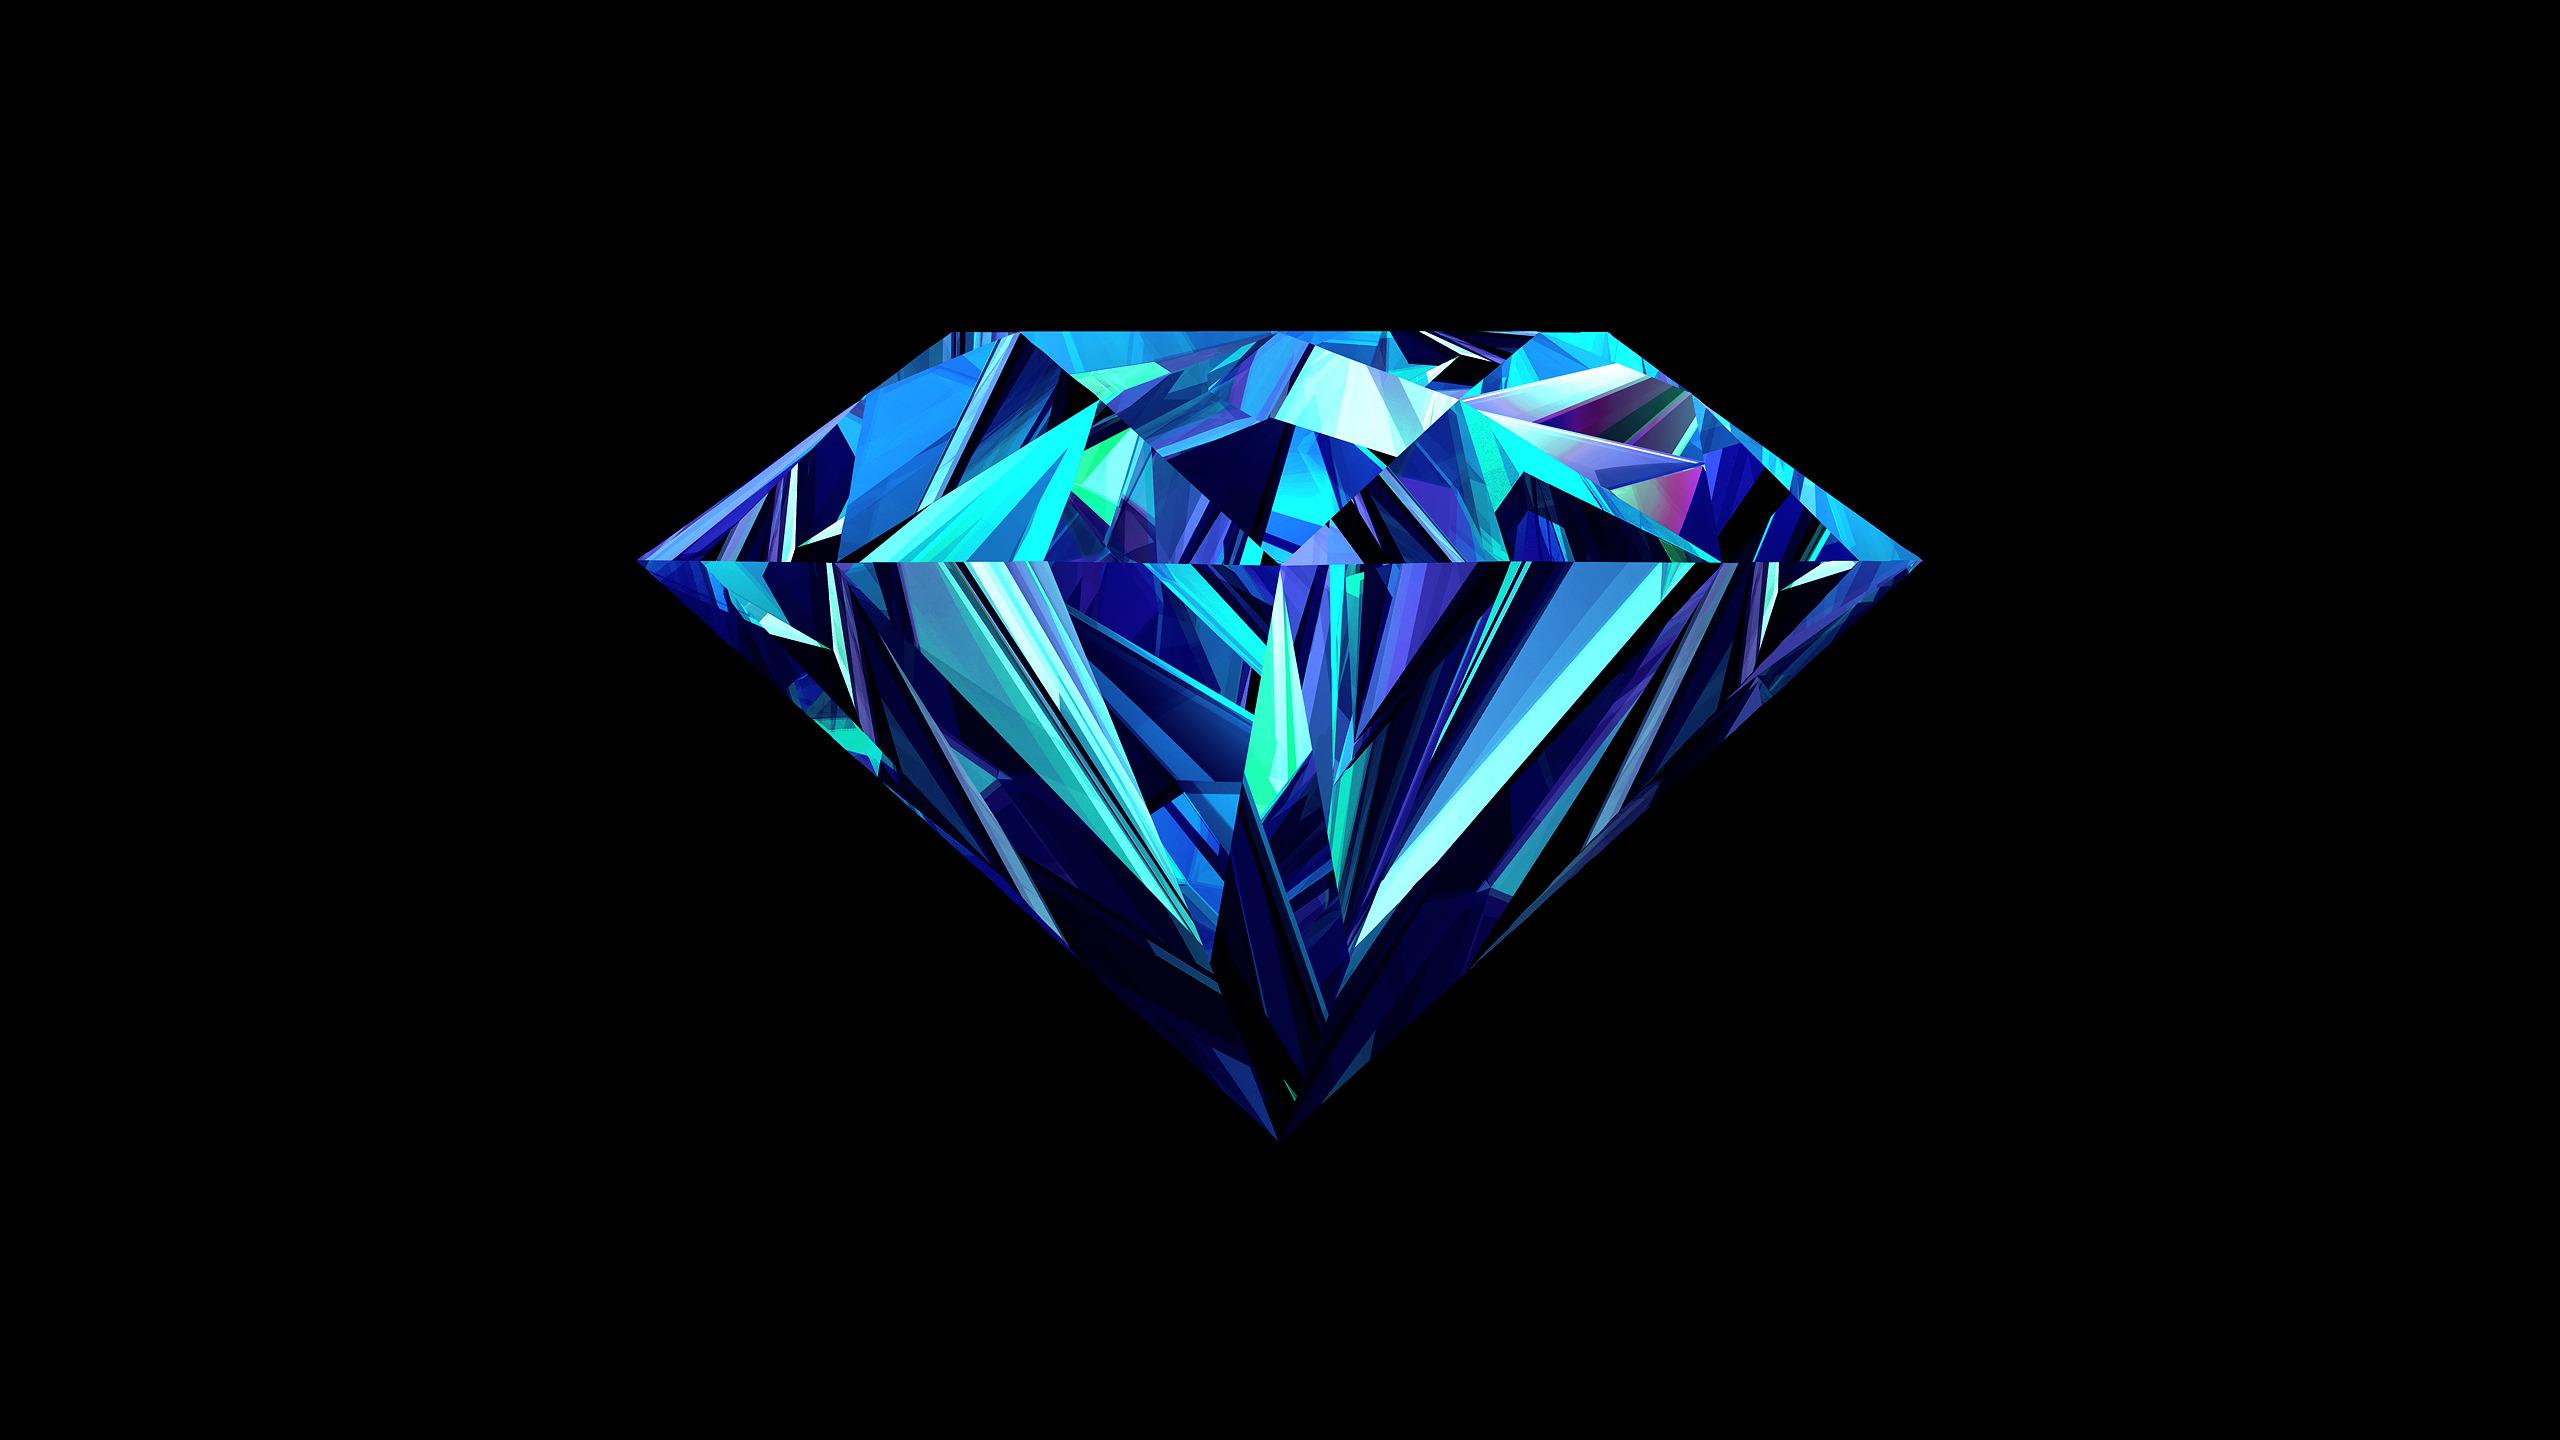 Space 3d Live Wallpaper Diamond Wallpaper Background 48970 2560x1440 Px